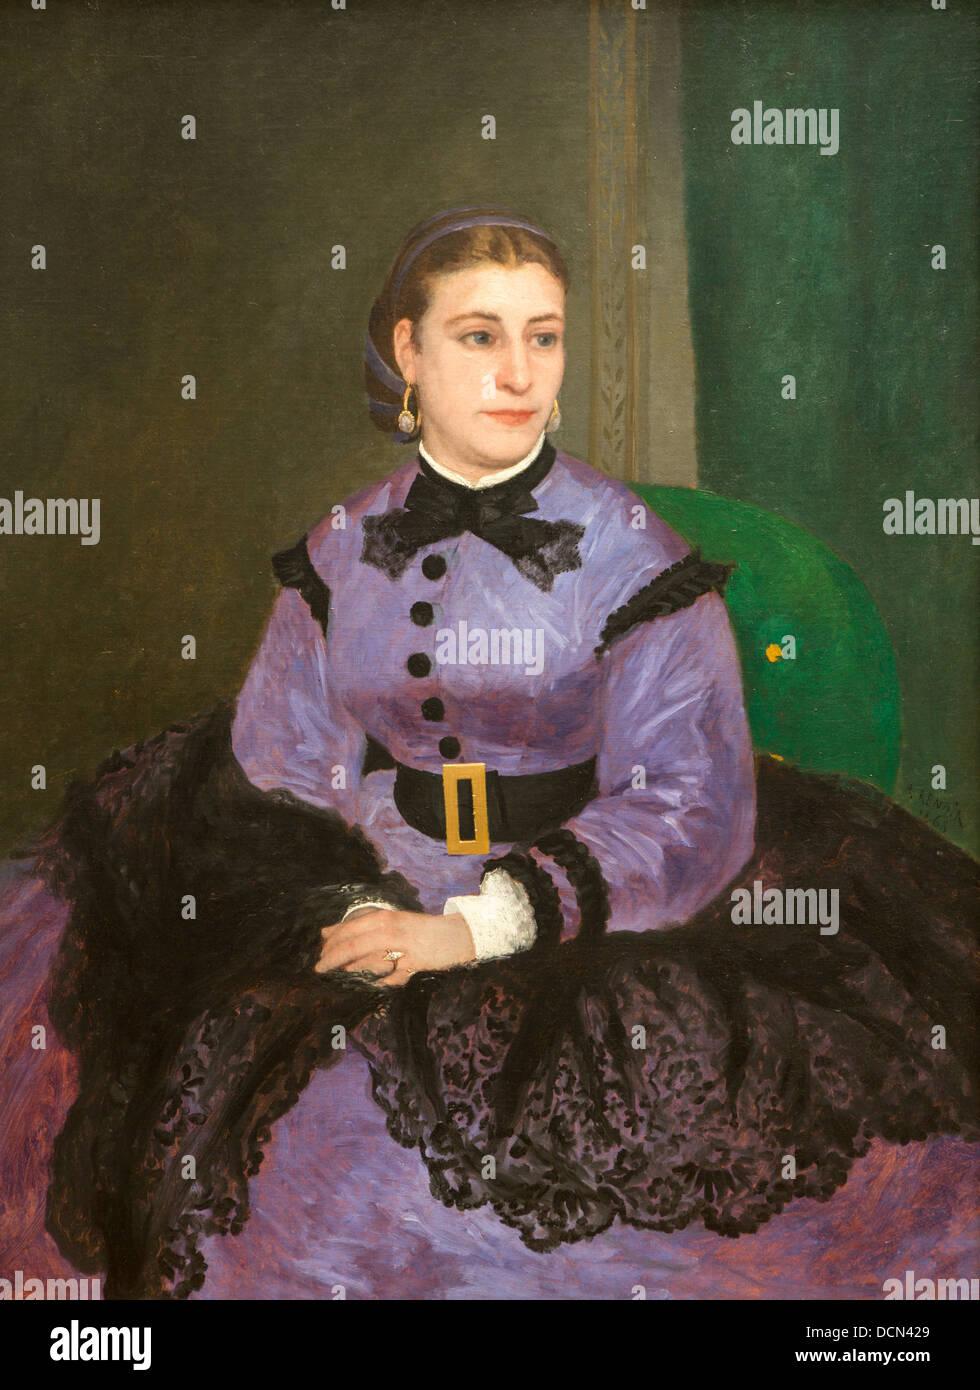 19th century  -  Mademoiselle Sicot, 1865 - Auguste Renoir Philippe Sauvan-Magnet / Active Museum - Stock Image